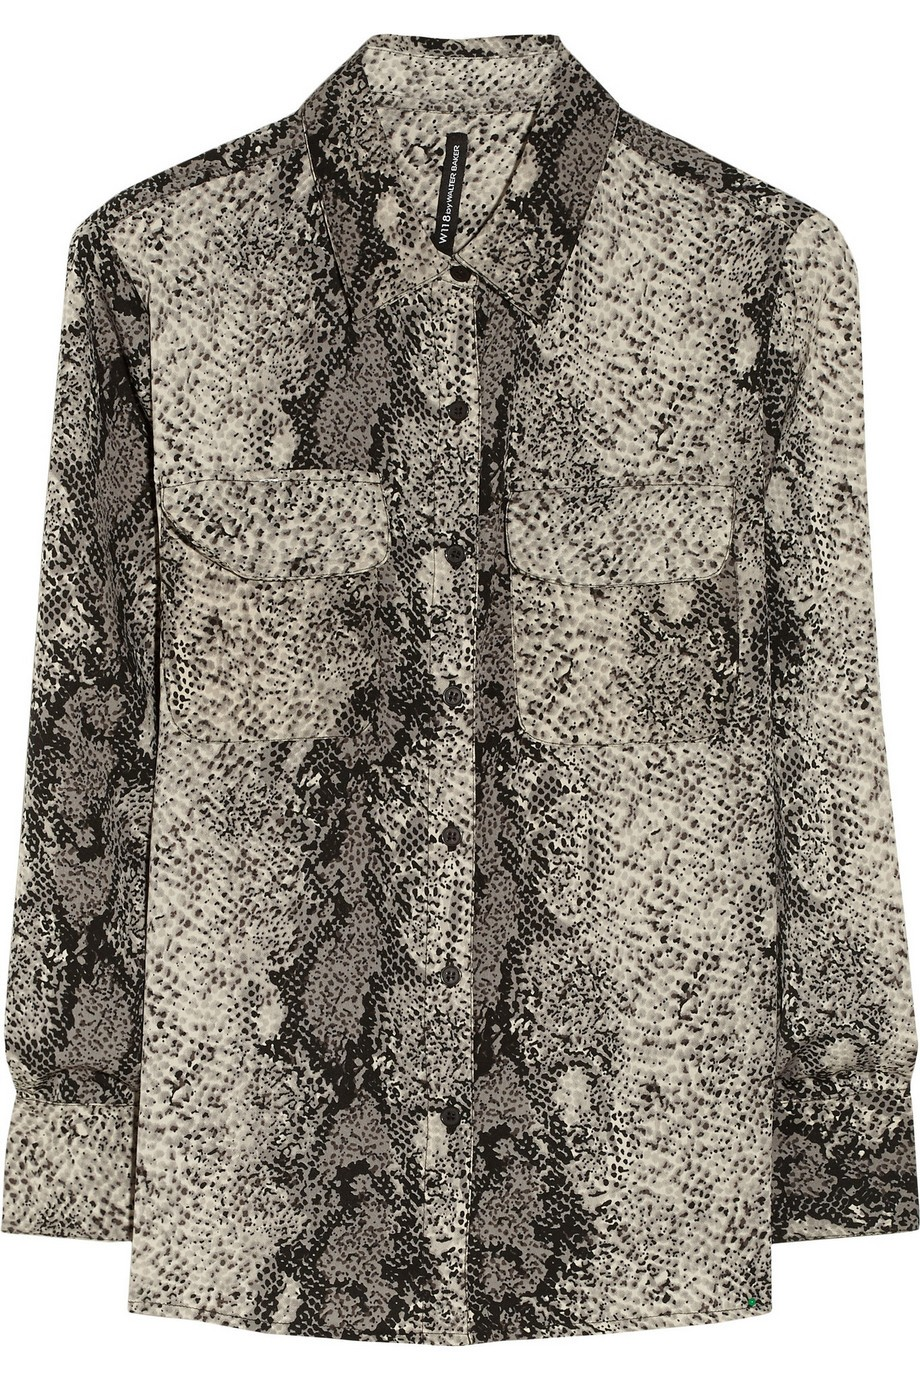 Raquel snake-print satin shirt